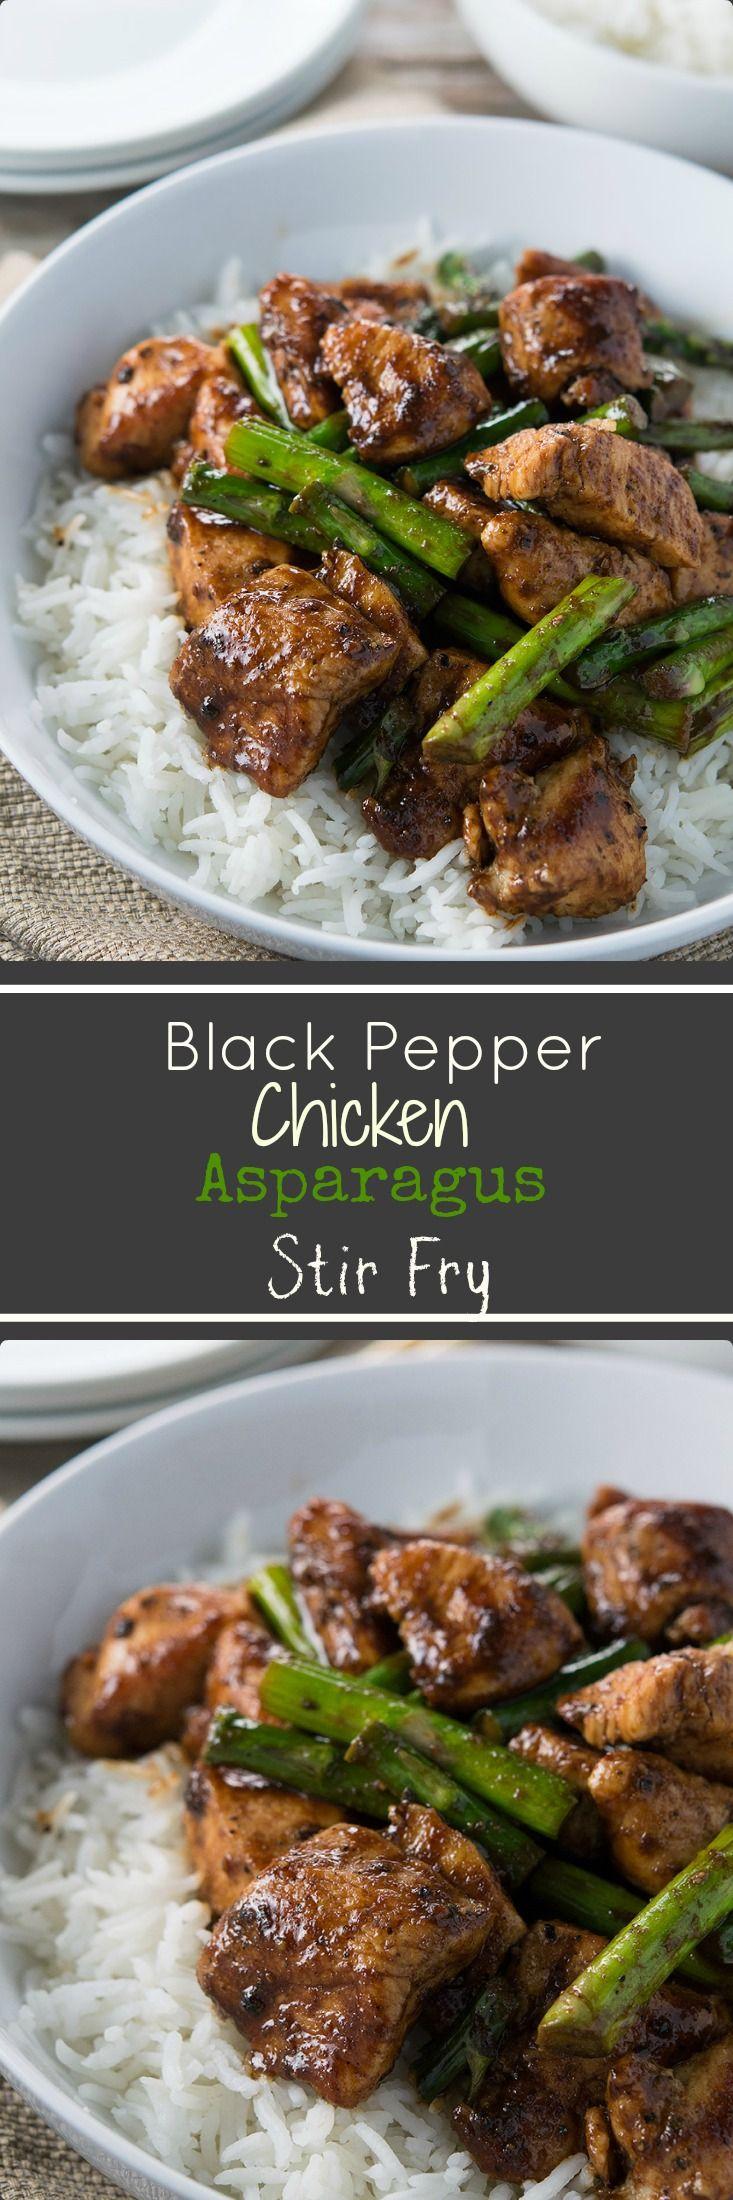 Black Pepper Chicken and Asparagus Stir Fry | Rezept | yum by ...